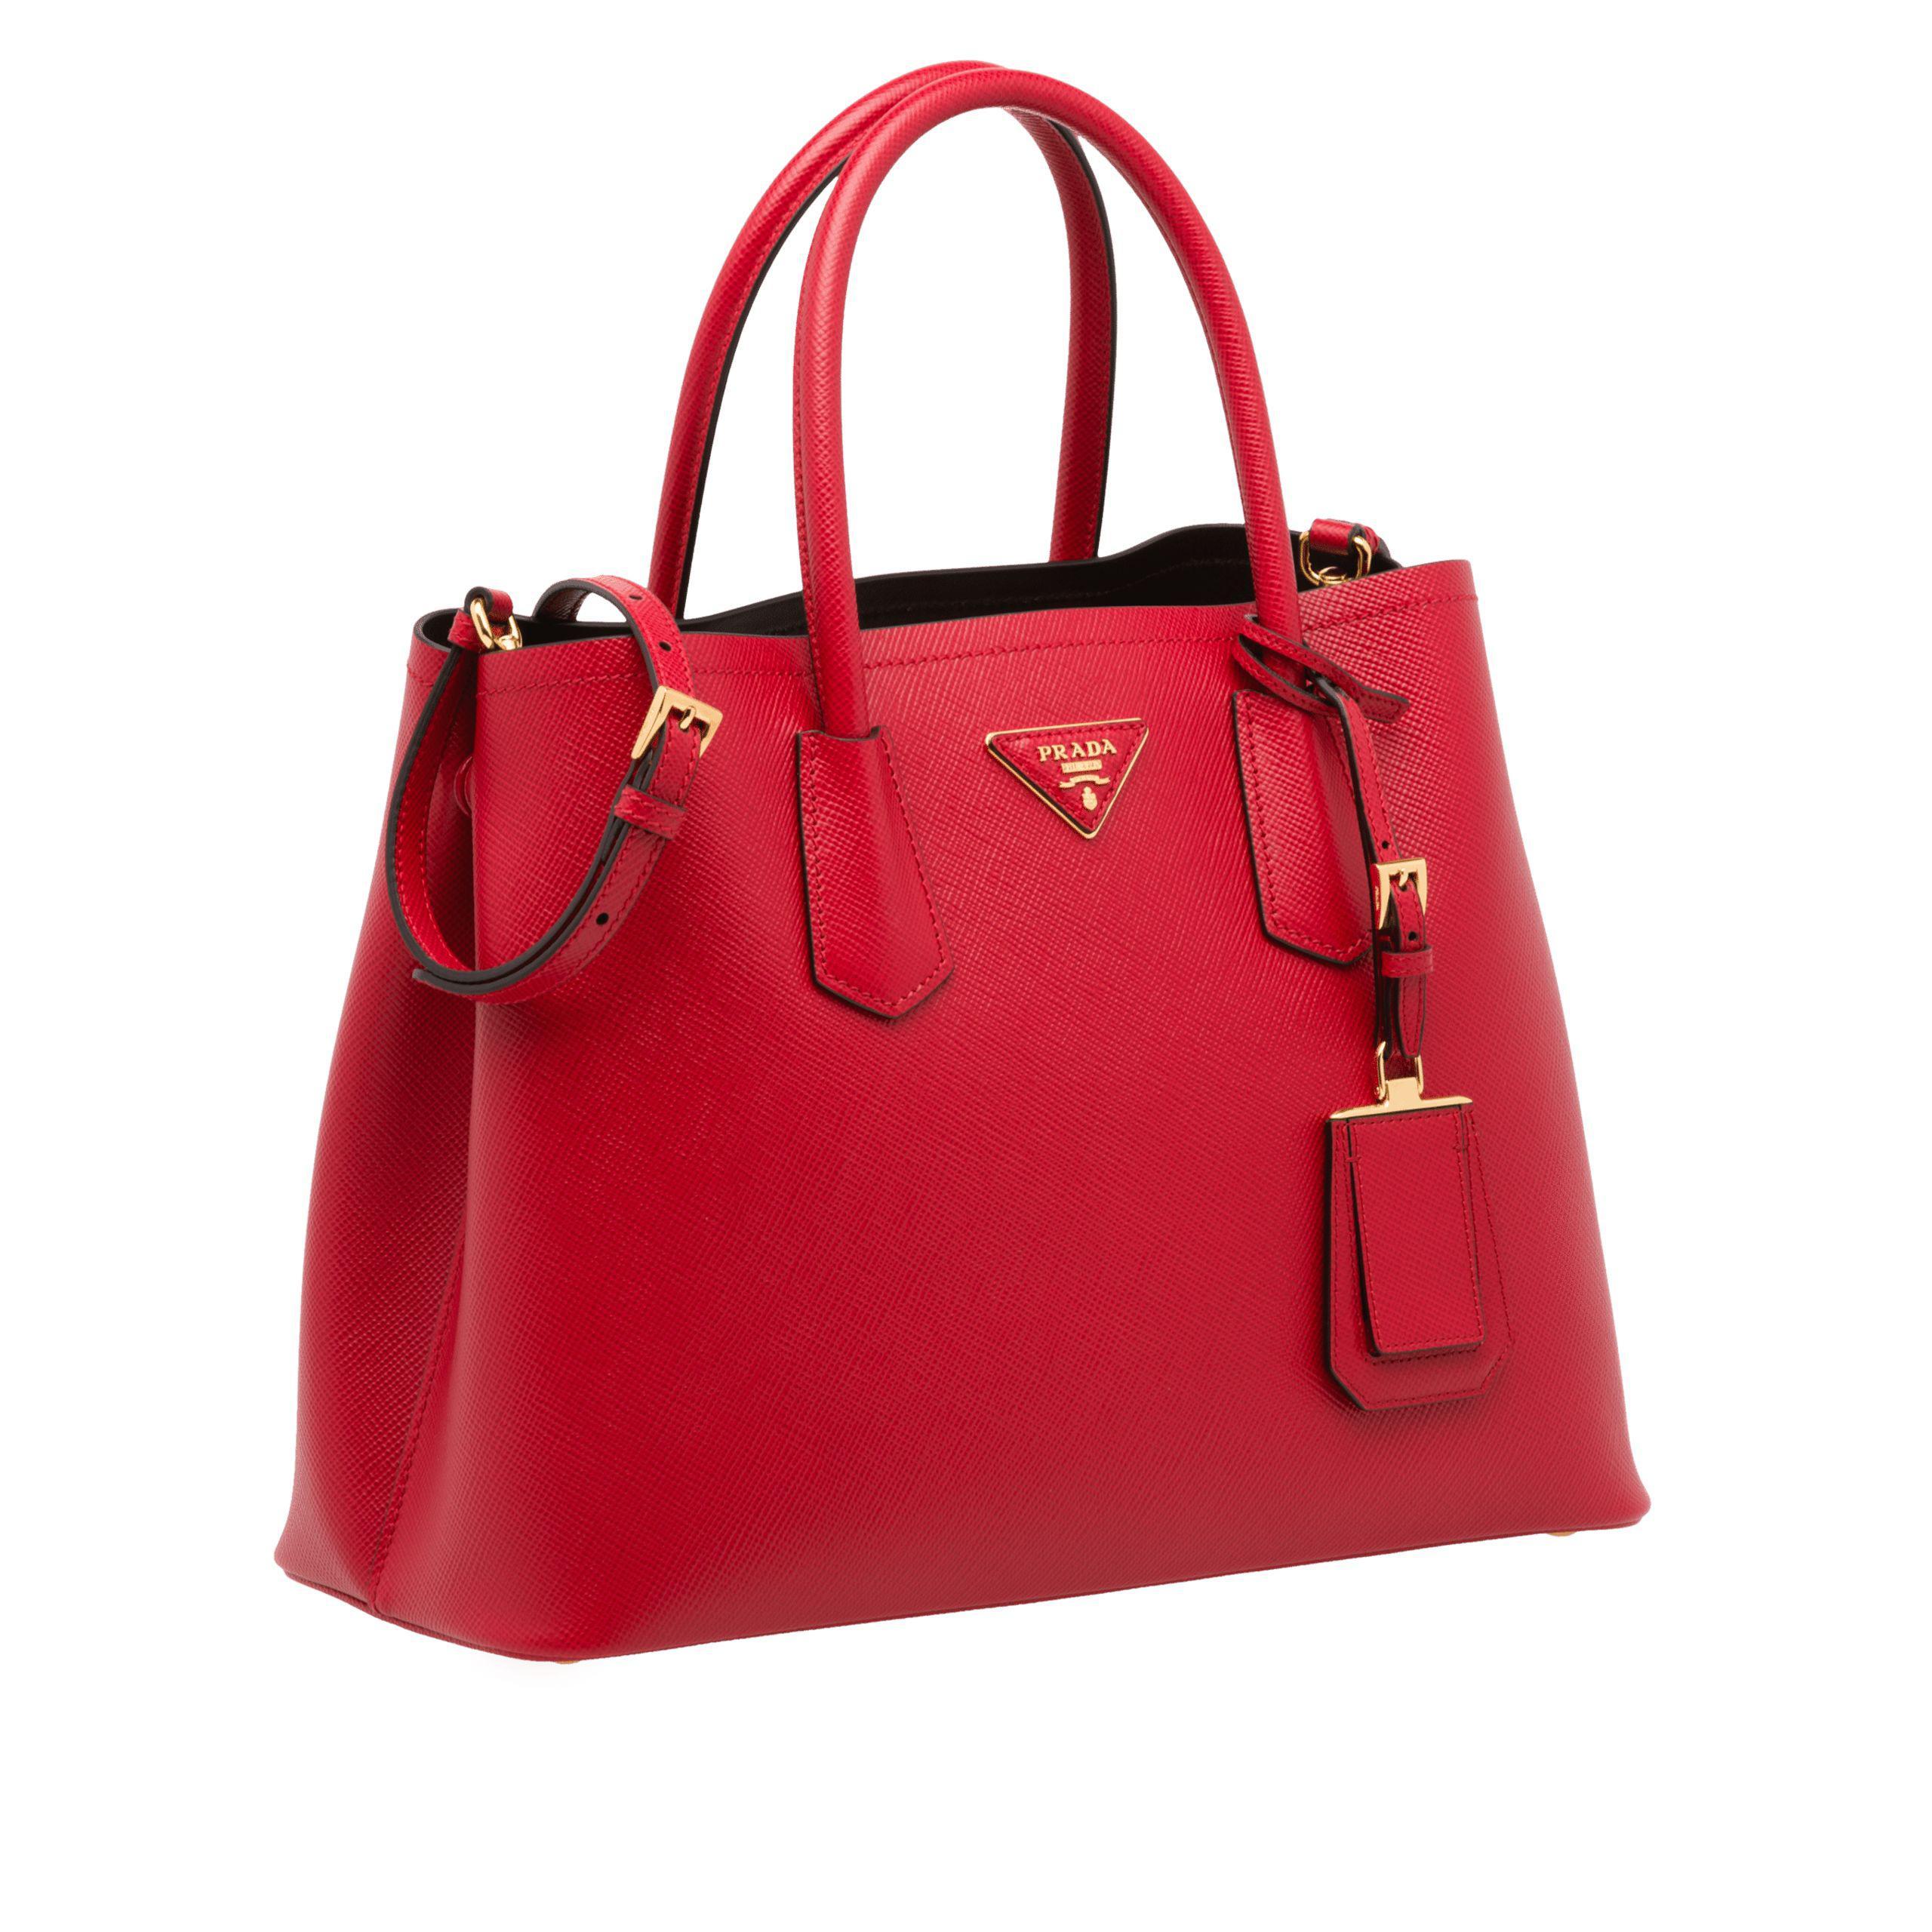 store prada red double bag lyst. view fullscreen 0578a d11c9 9122aa72bc72d